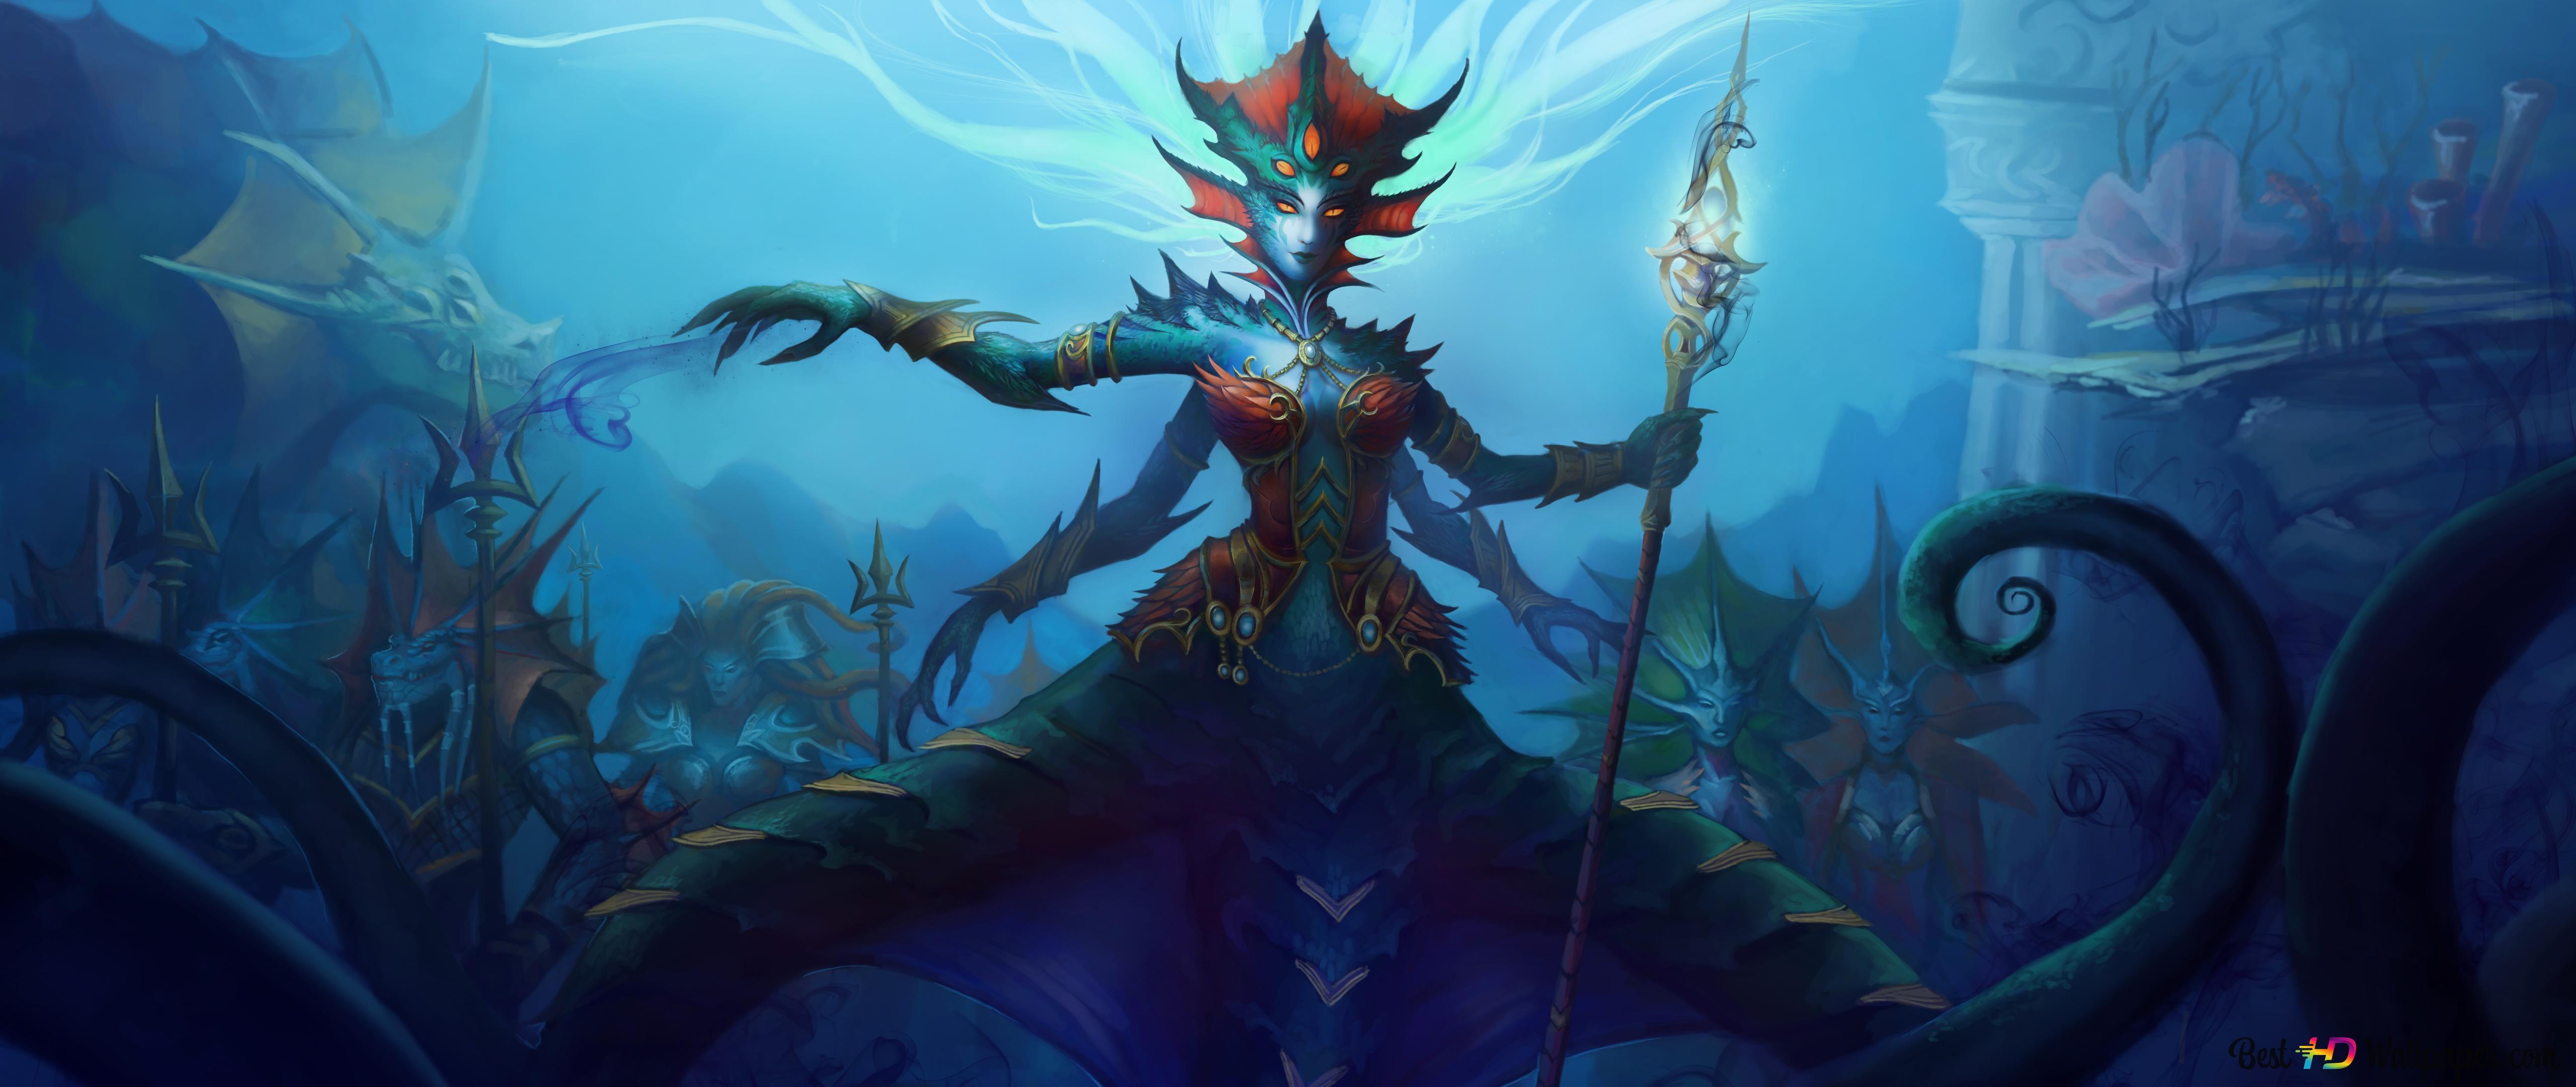 World Of Warcraft Queen Azshara Hd Wallpaper Download